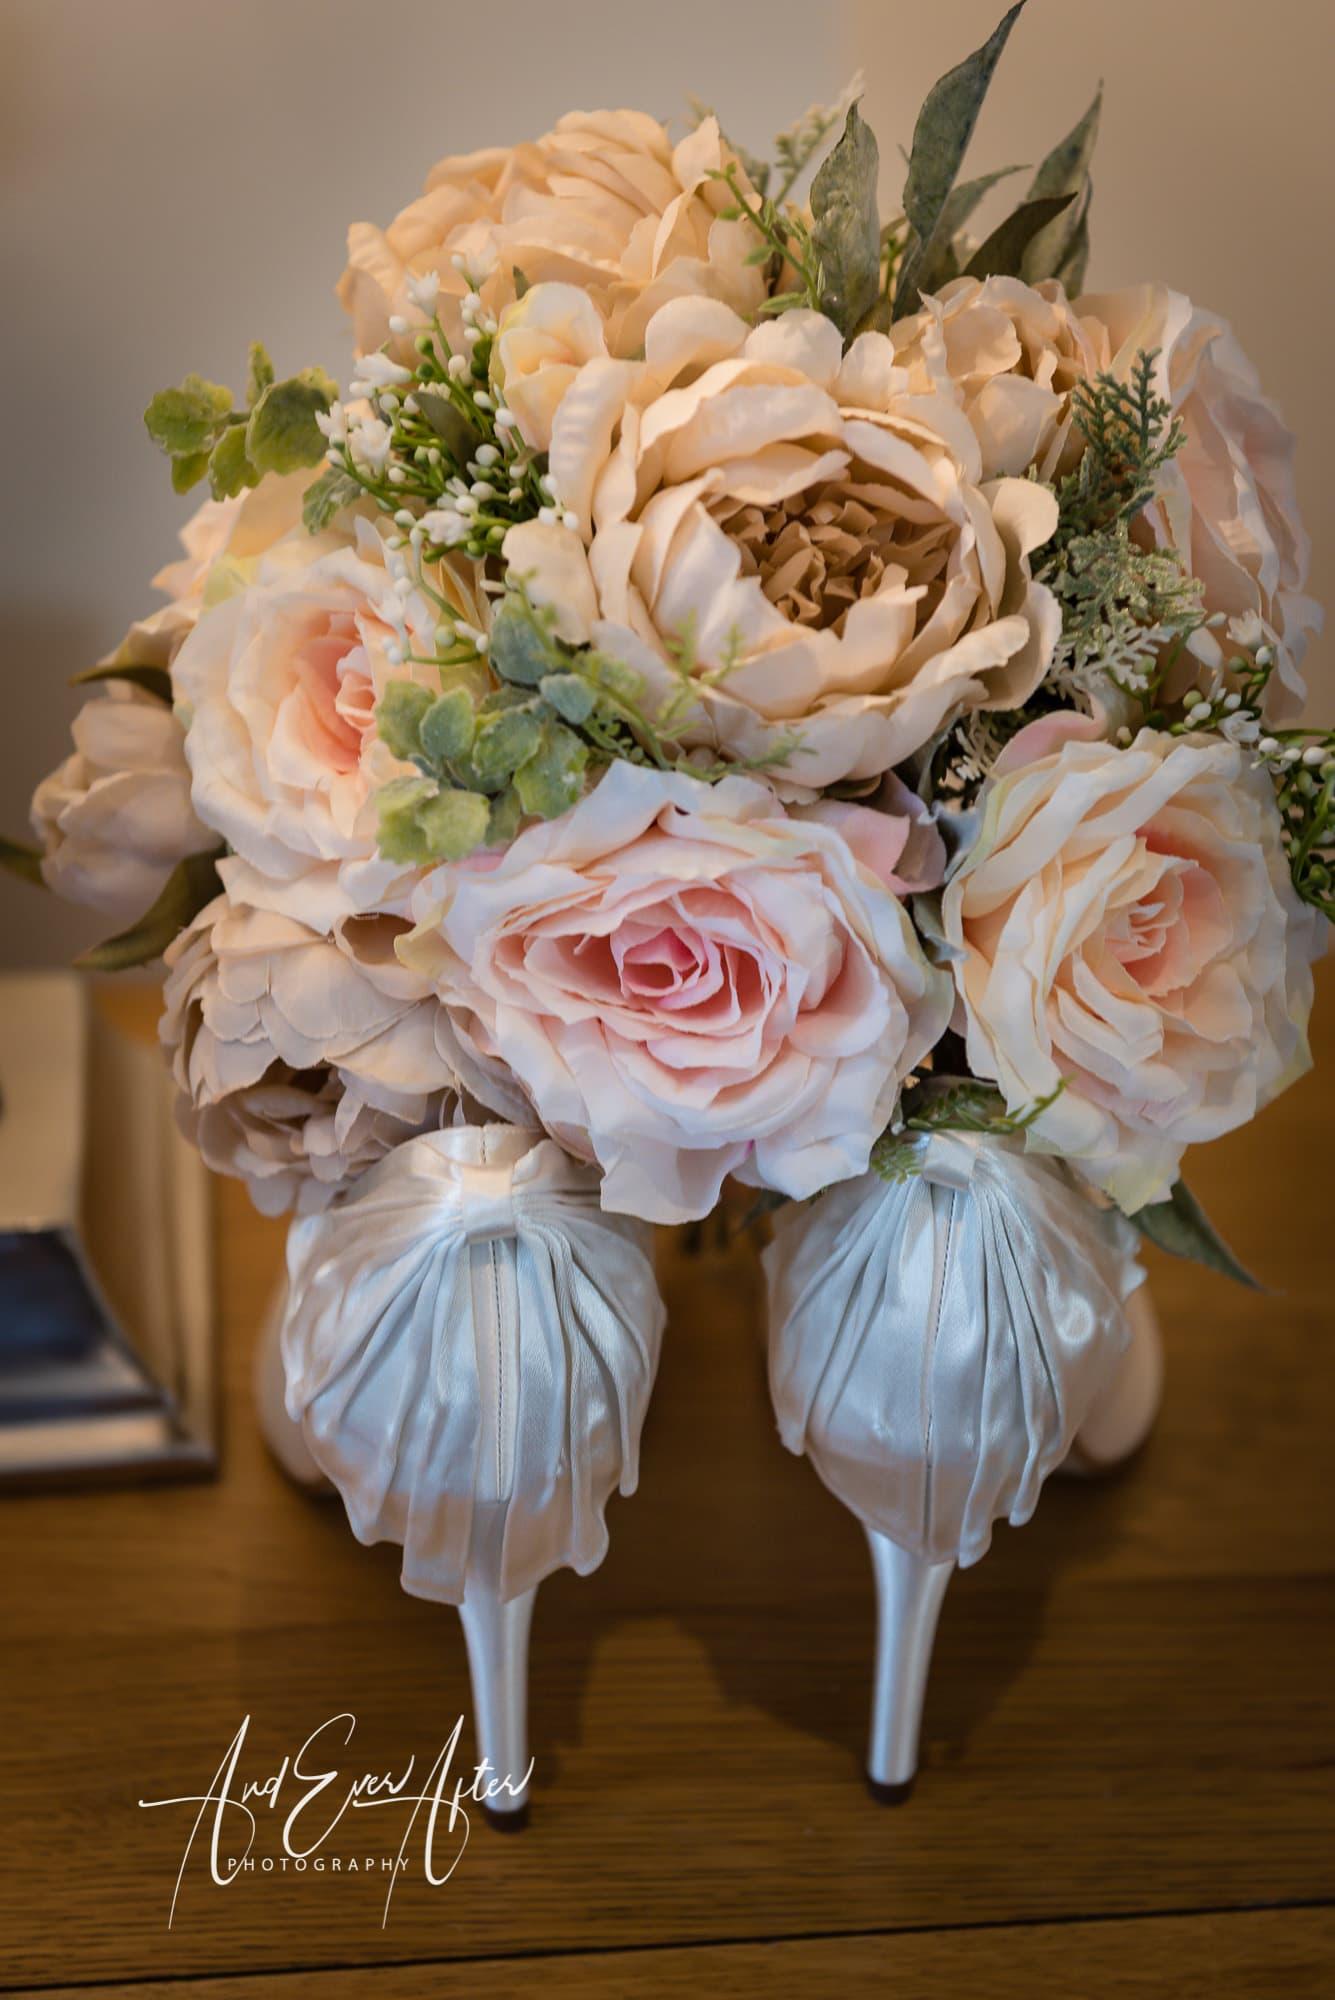 Brides shoes, wedding flowers